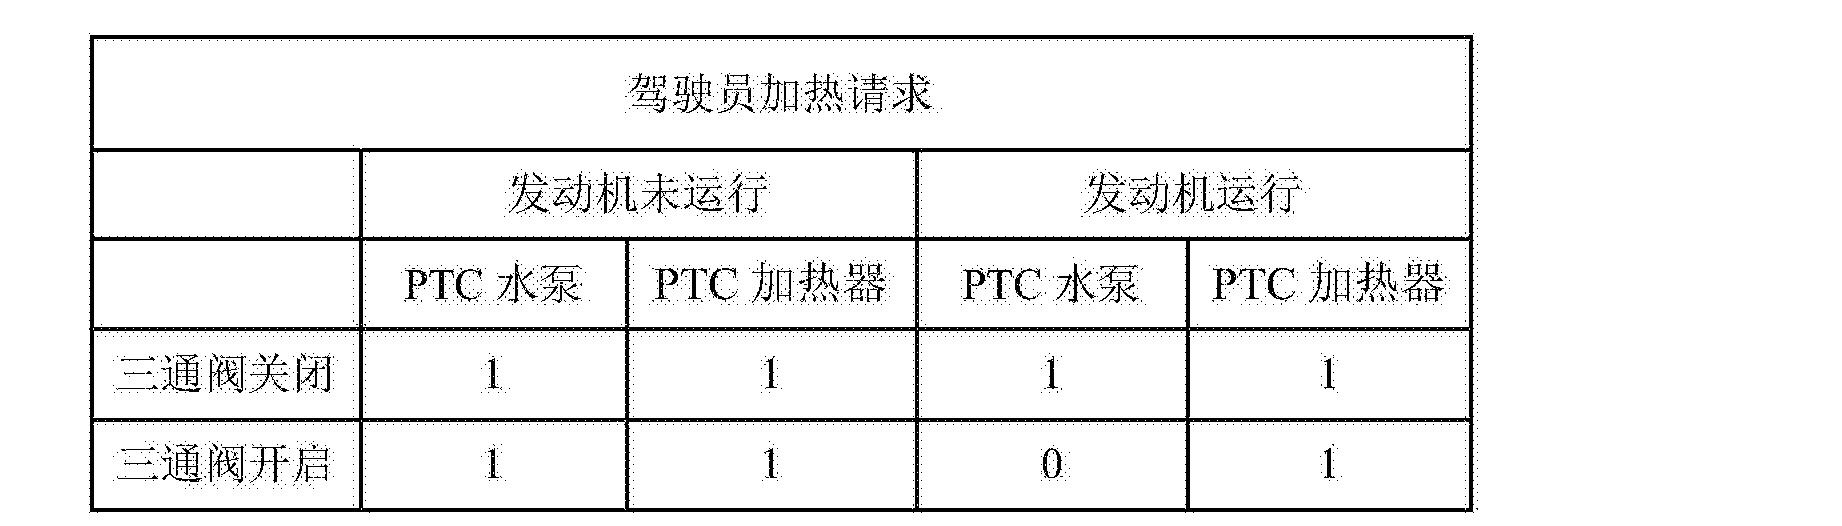 Figure CN104999891AD00061